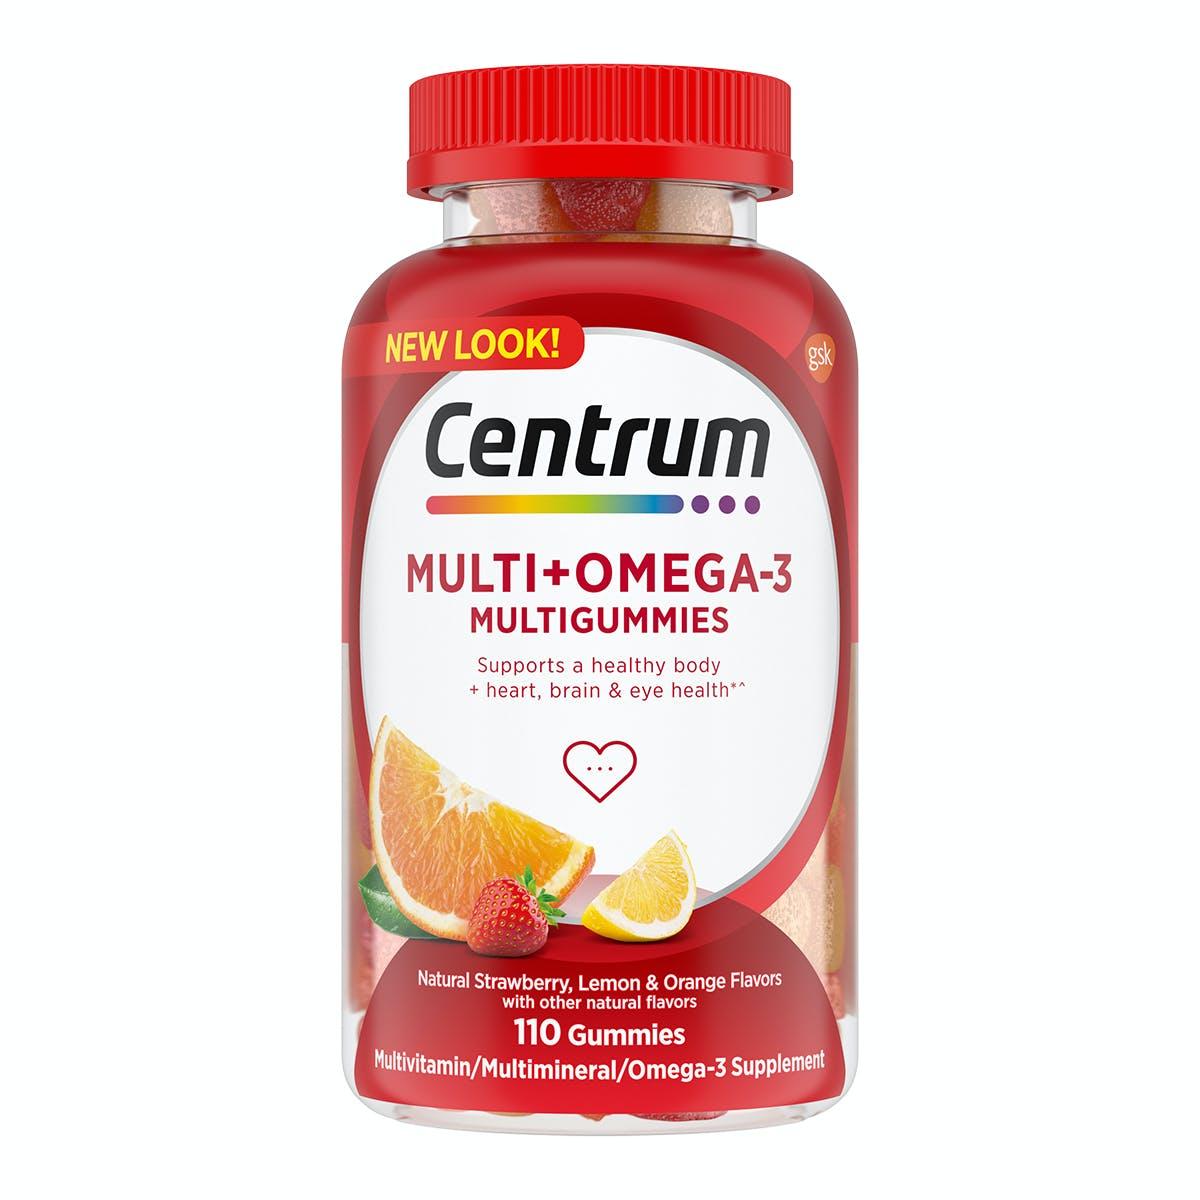 Bottle of Centrum MultiGummies Multi plus Omega 3 multivitamins